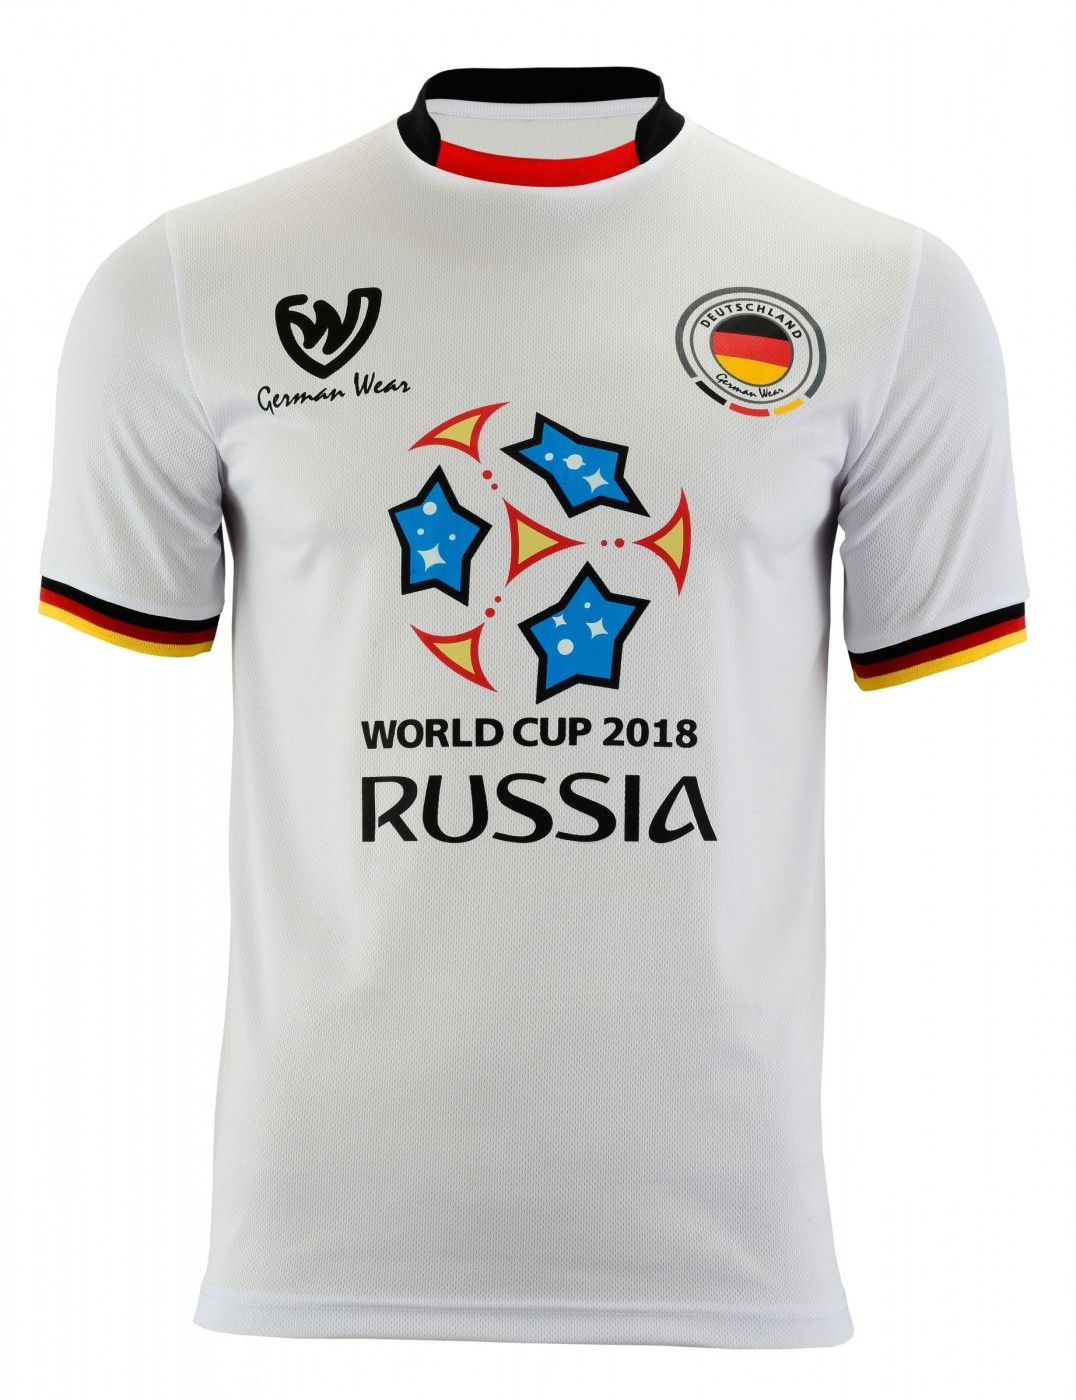 Deutschland Wm 2018 Fan Trikot Fussballtrikot Fussball Weltmeisterschaft Fussballtrikot Weltmeisterschaft Deutschland Trikot